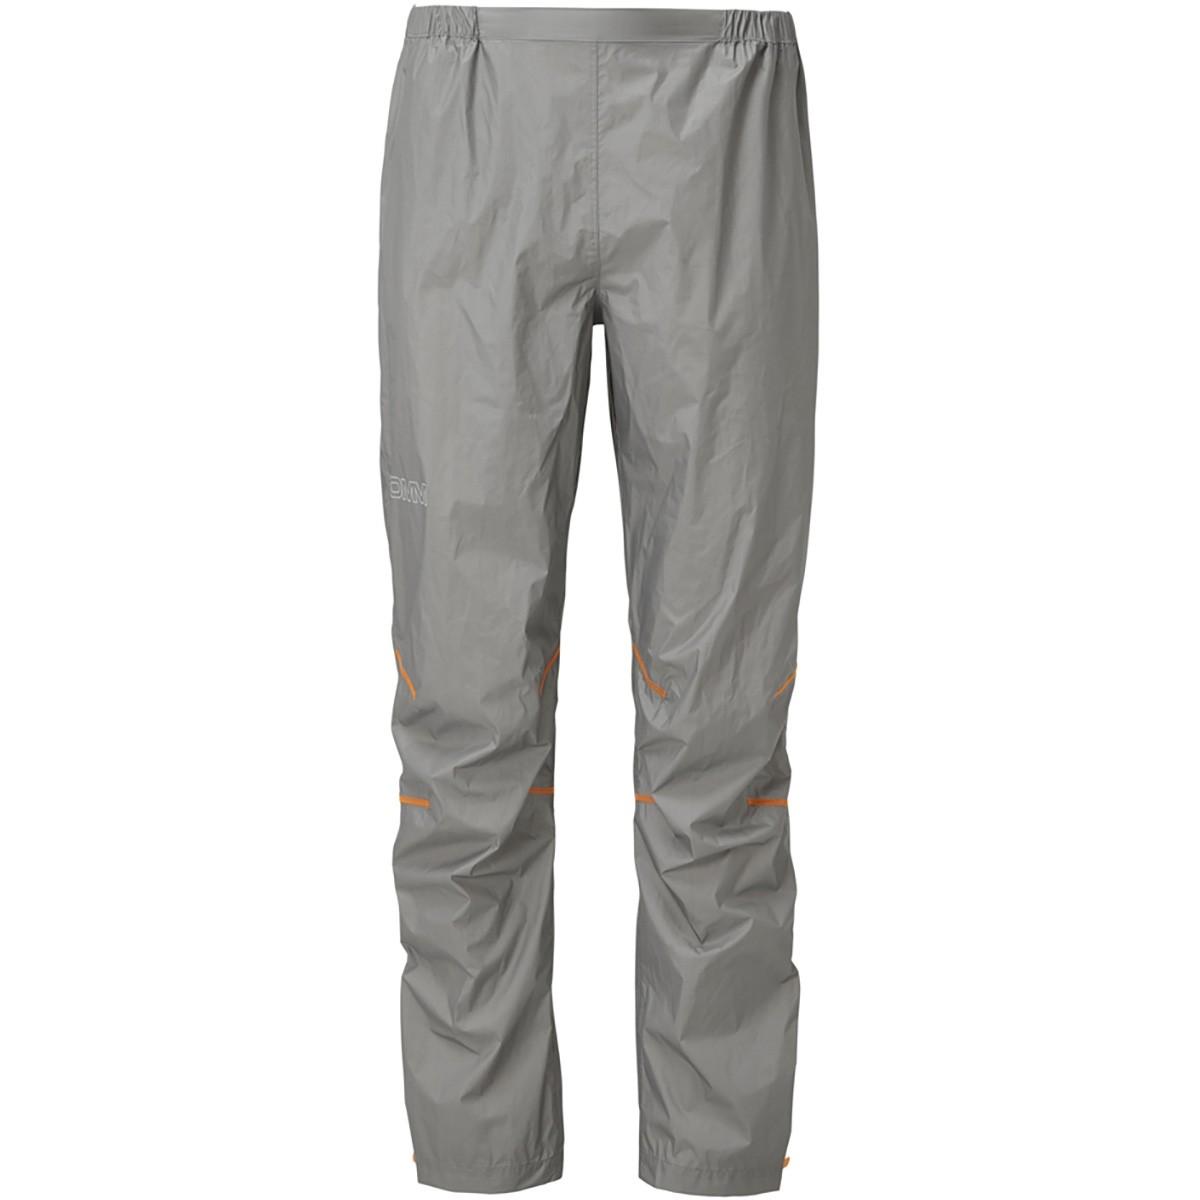 OMM Halo Men's Waterproof Pants - Grey